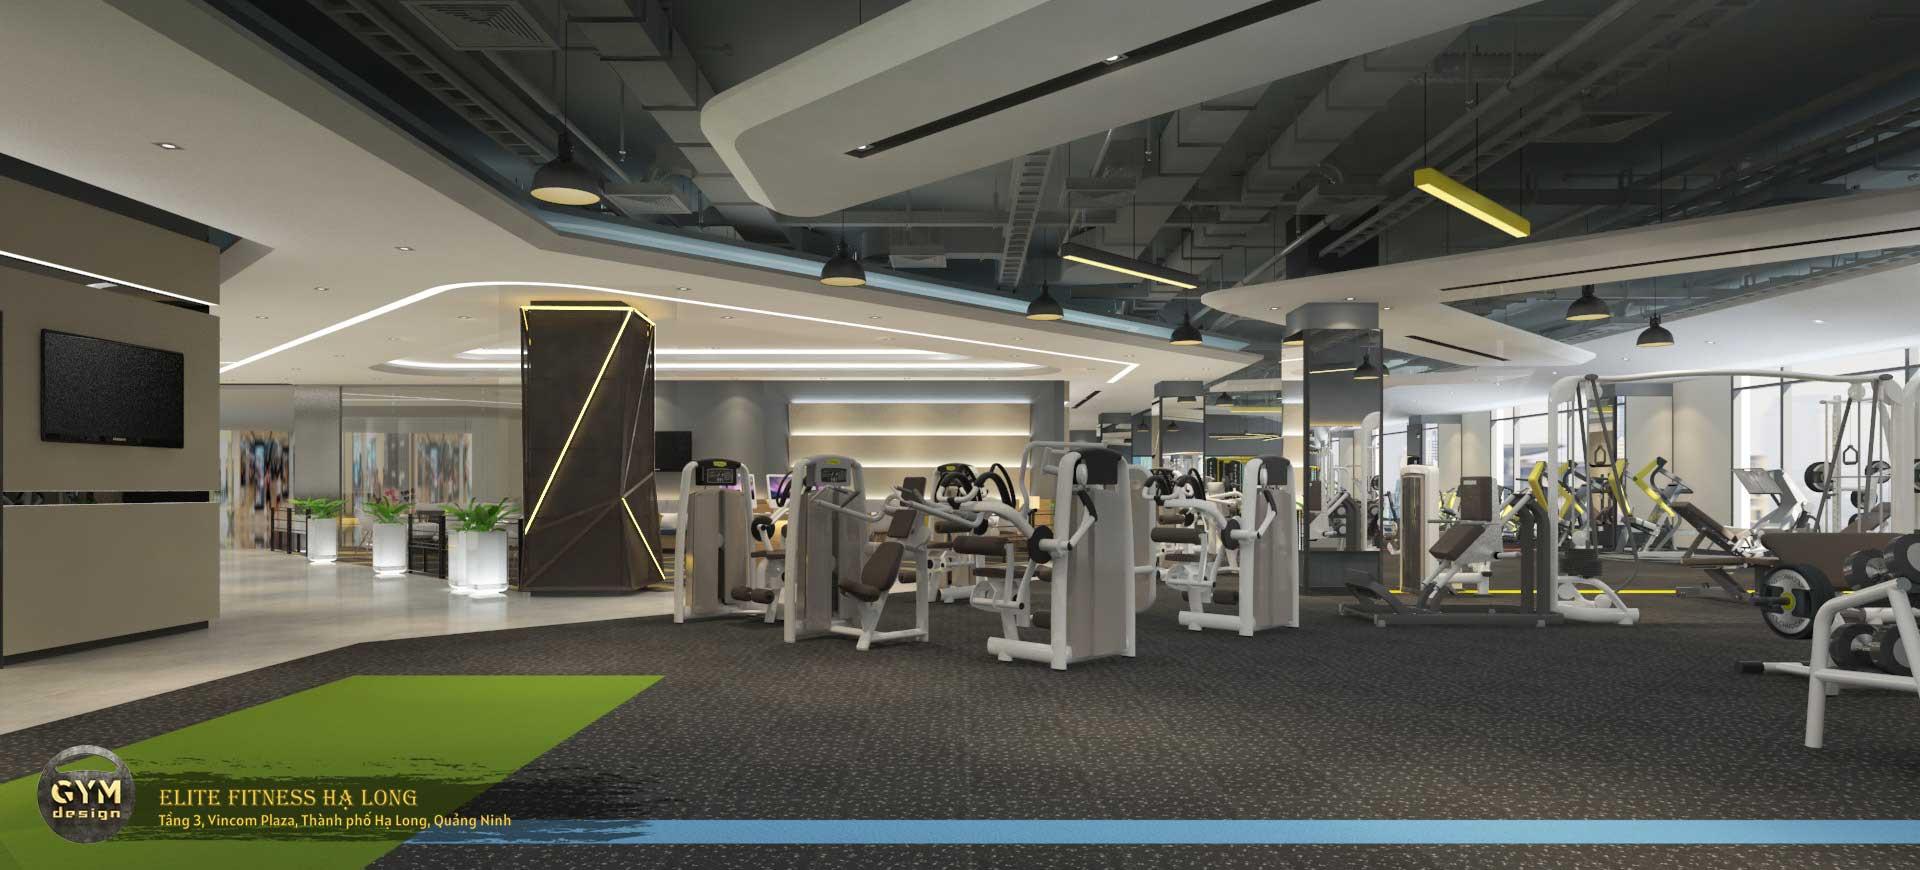 thiet-ke-phong-gym-elite-fitness-ha-long-17